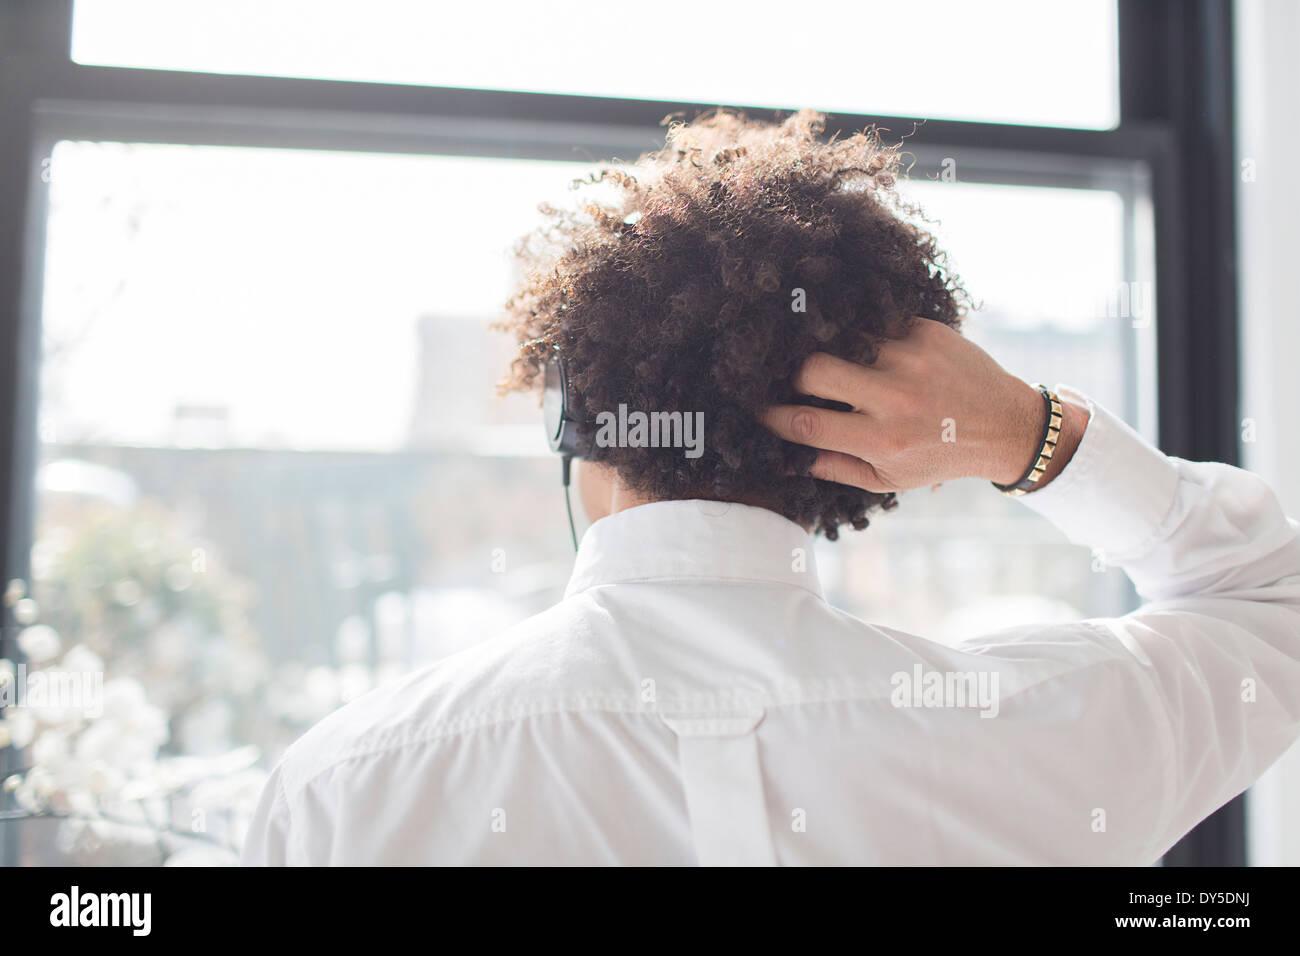 Joven rascarse la cabeza, vista trasera Imagen De Stock